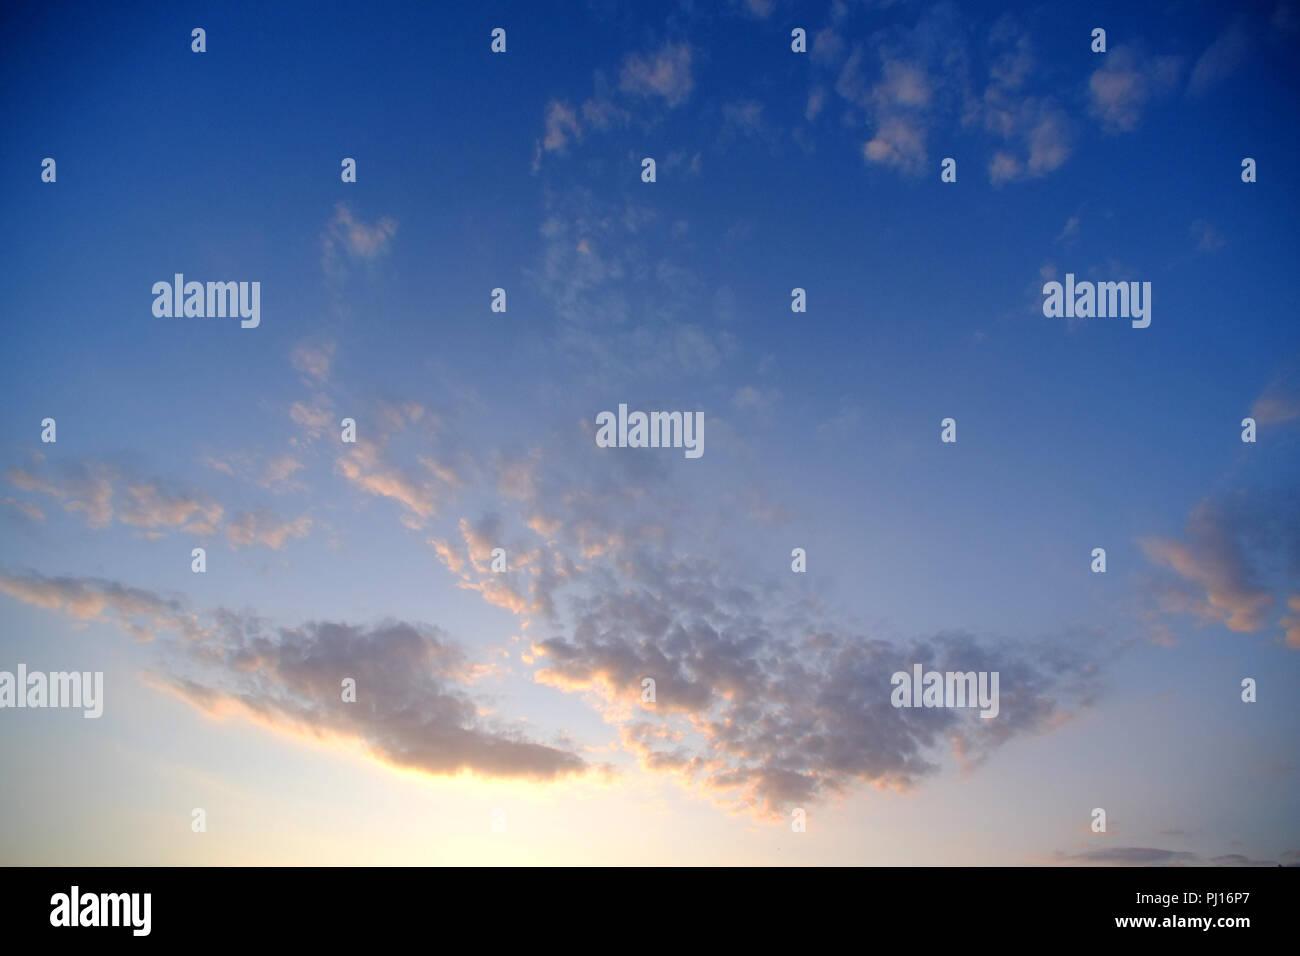 Alto cumulus cloud patterns at sunset. - Stock Image